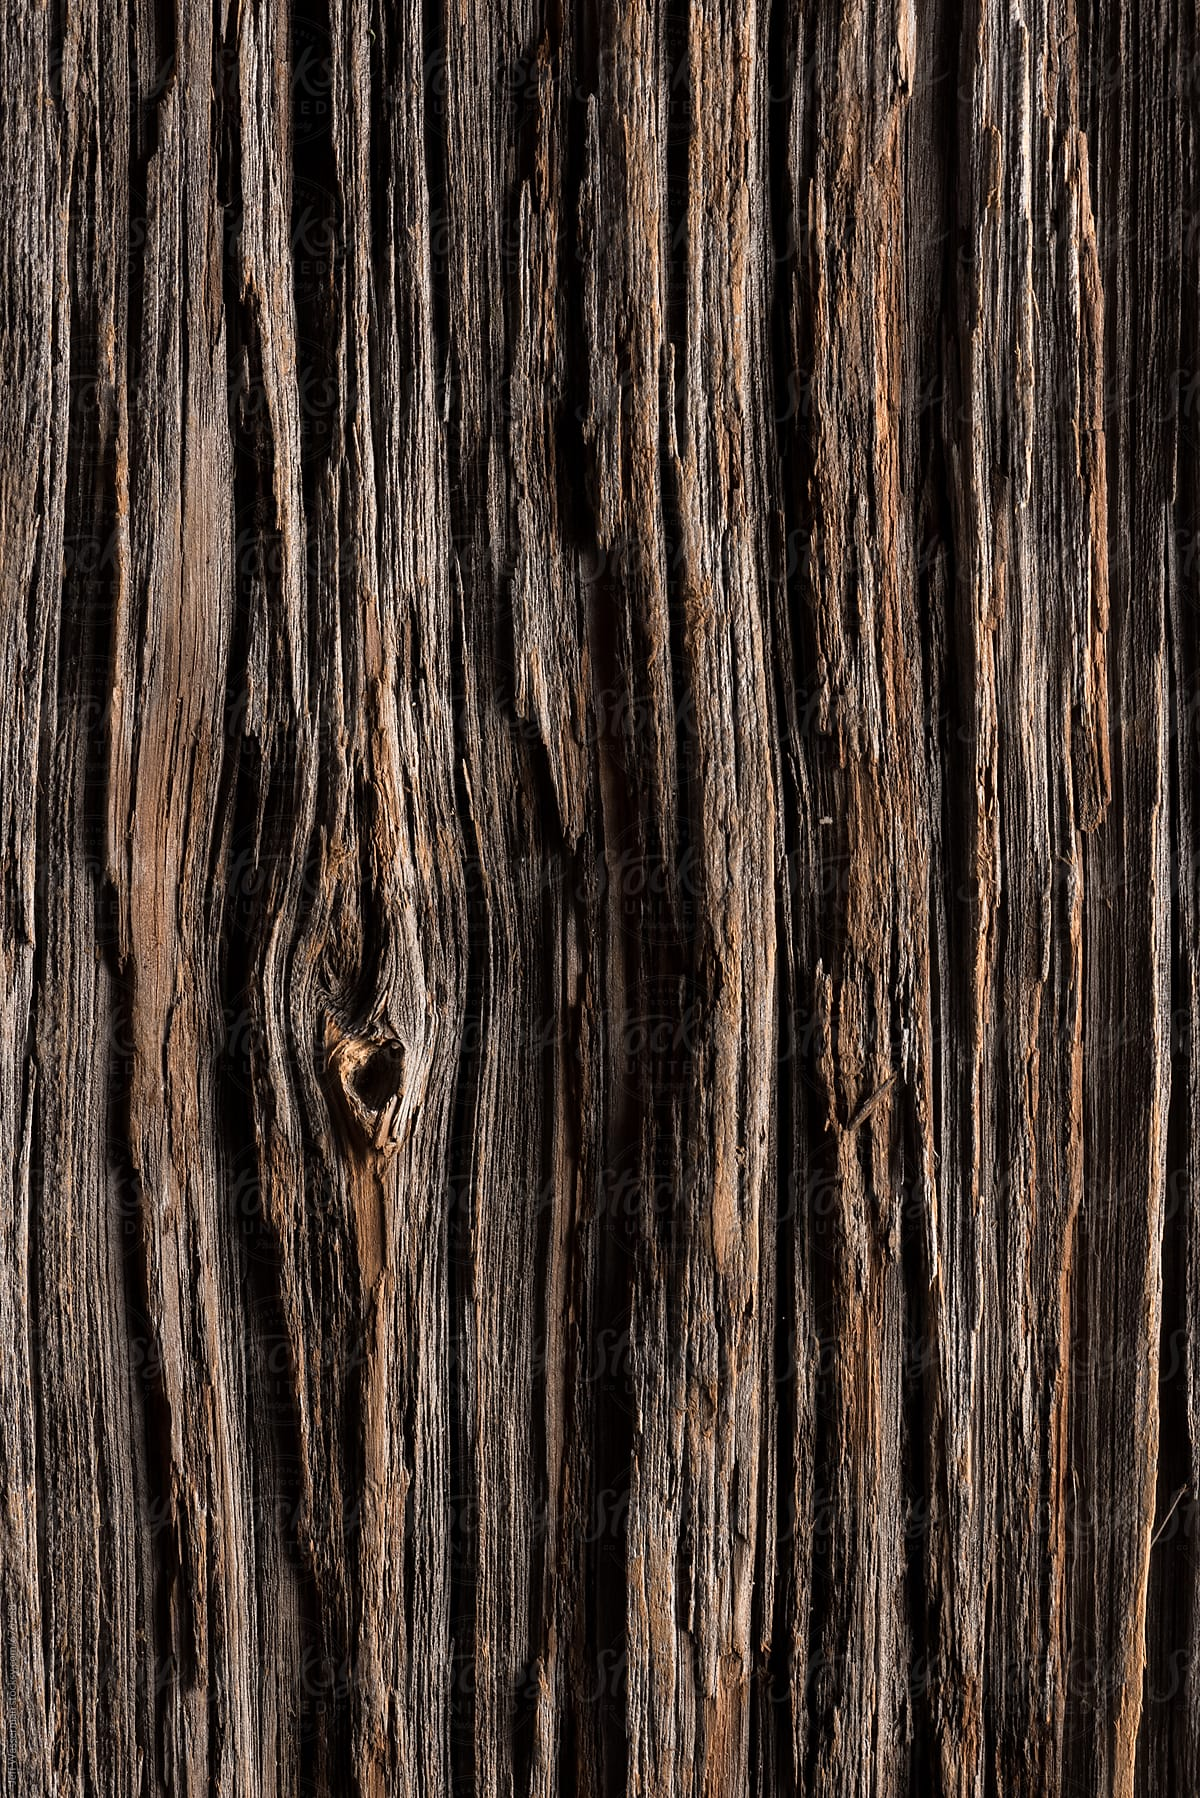 barnwood texture background stocksy unitedbarnwood texture background